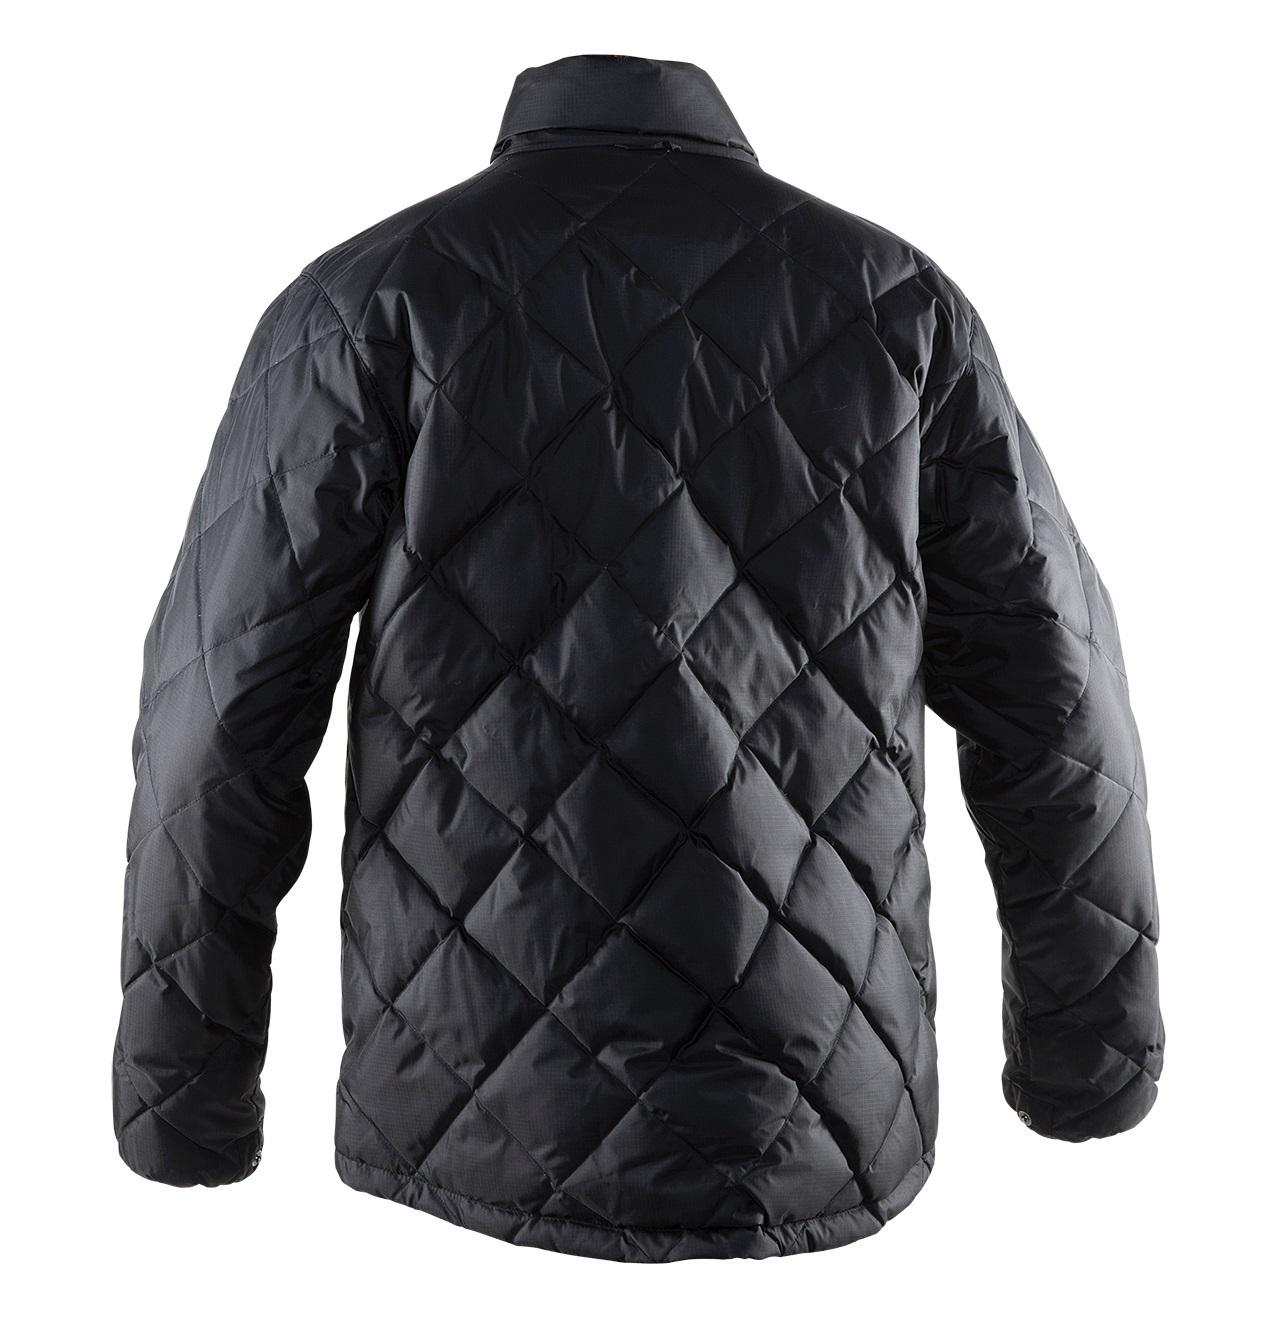 Мужская куртка-парка 8848 Altitude Bonato Zipin (703156) внутренняя куртка